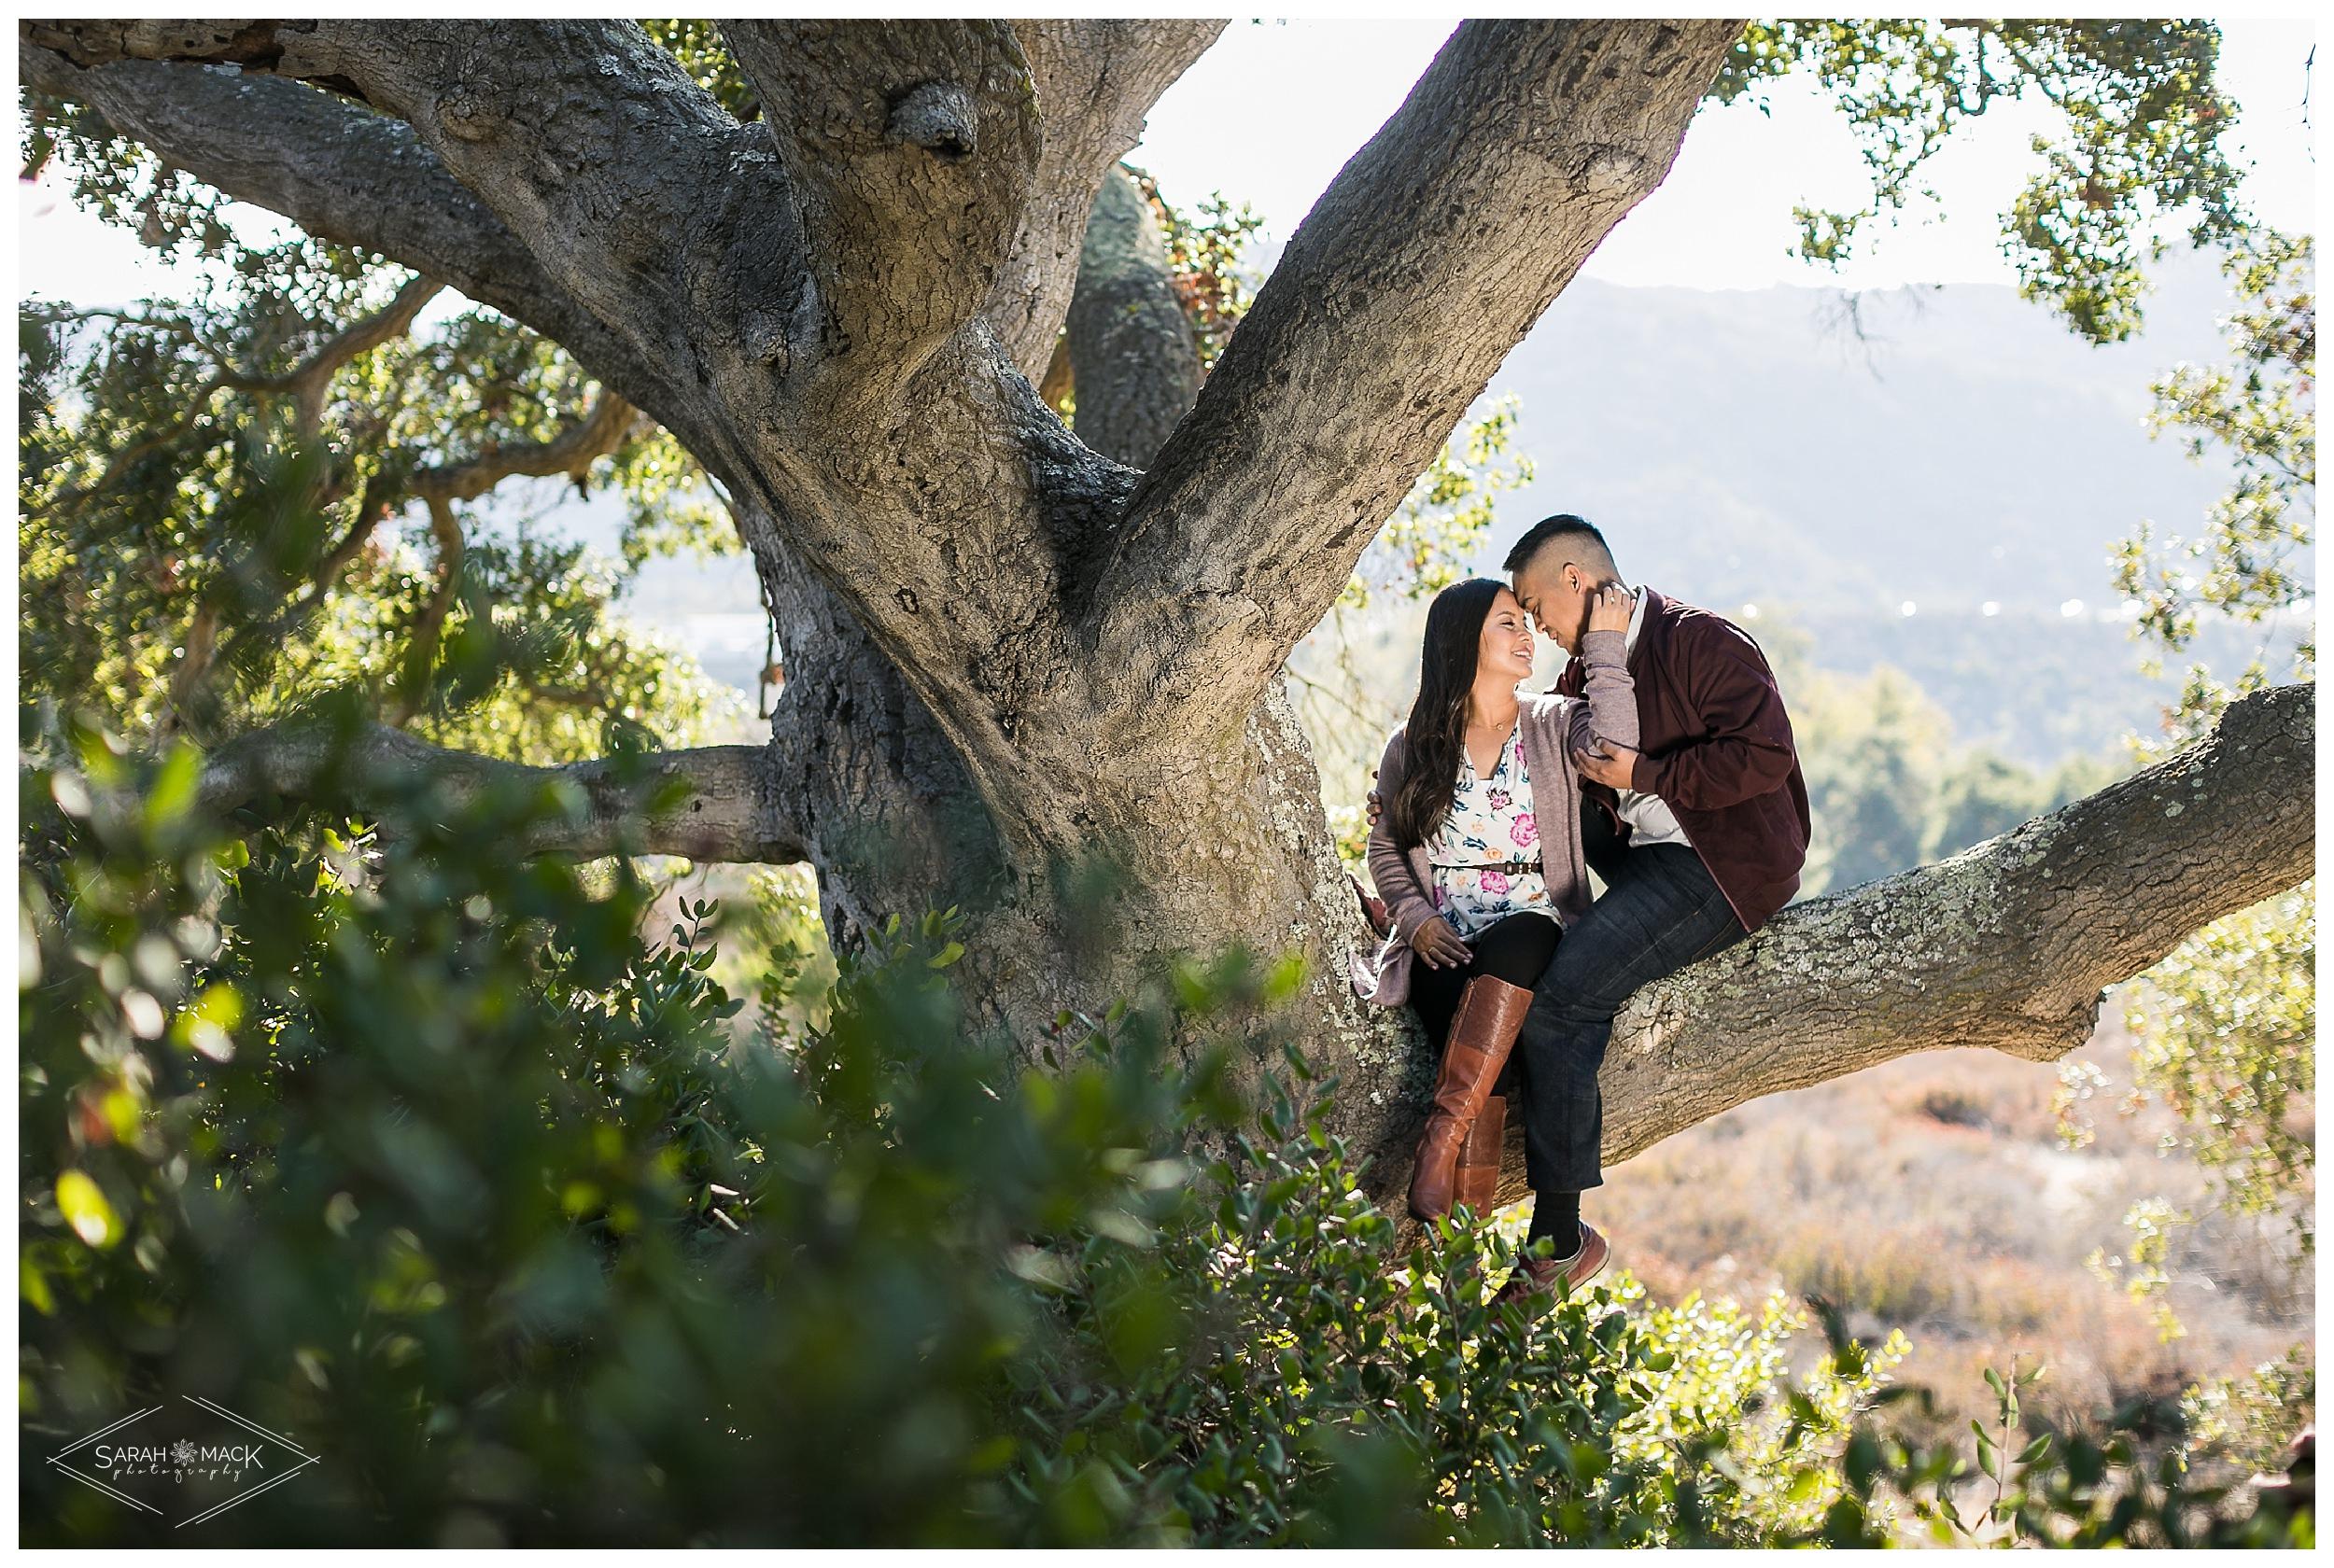 LE_Orange-County-Engagement-Photography 38.jpg